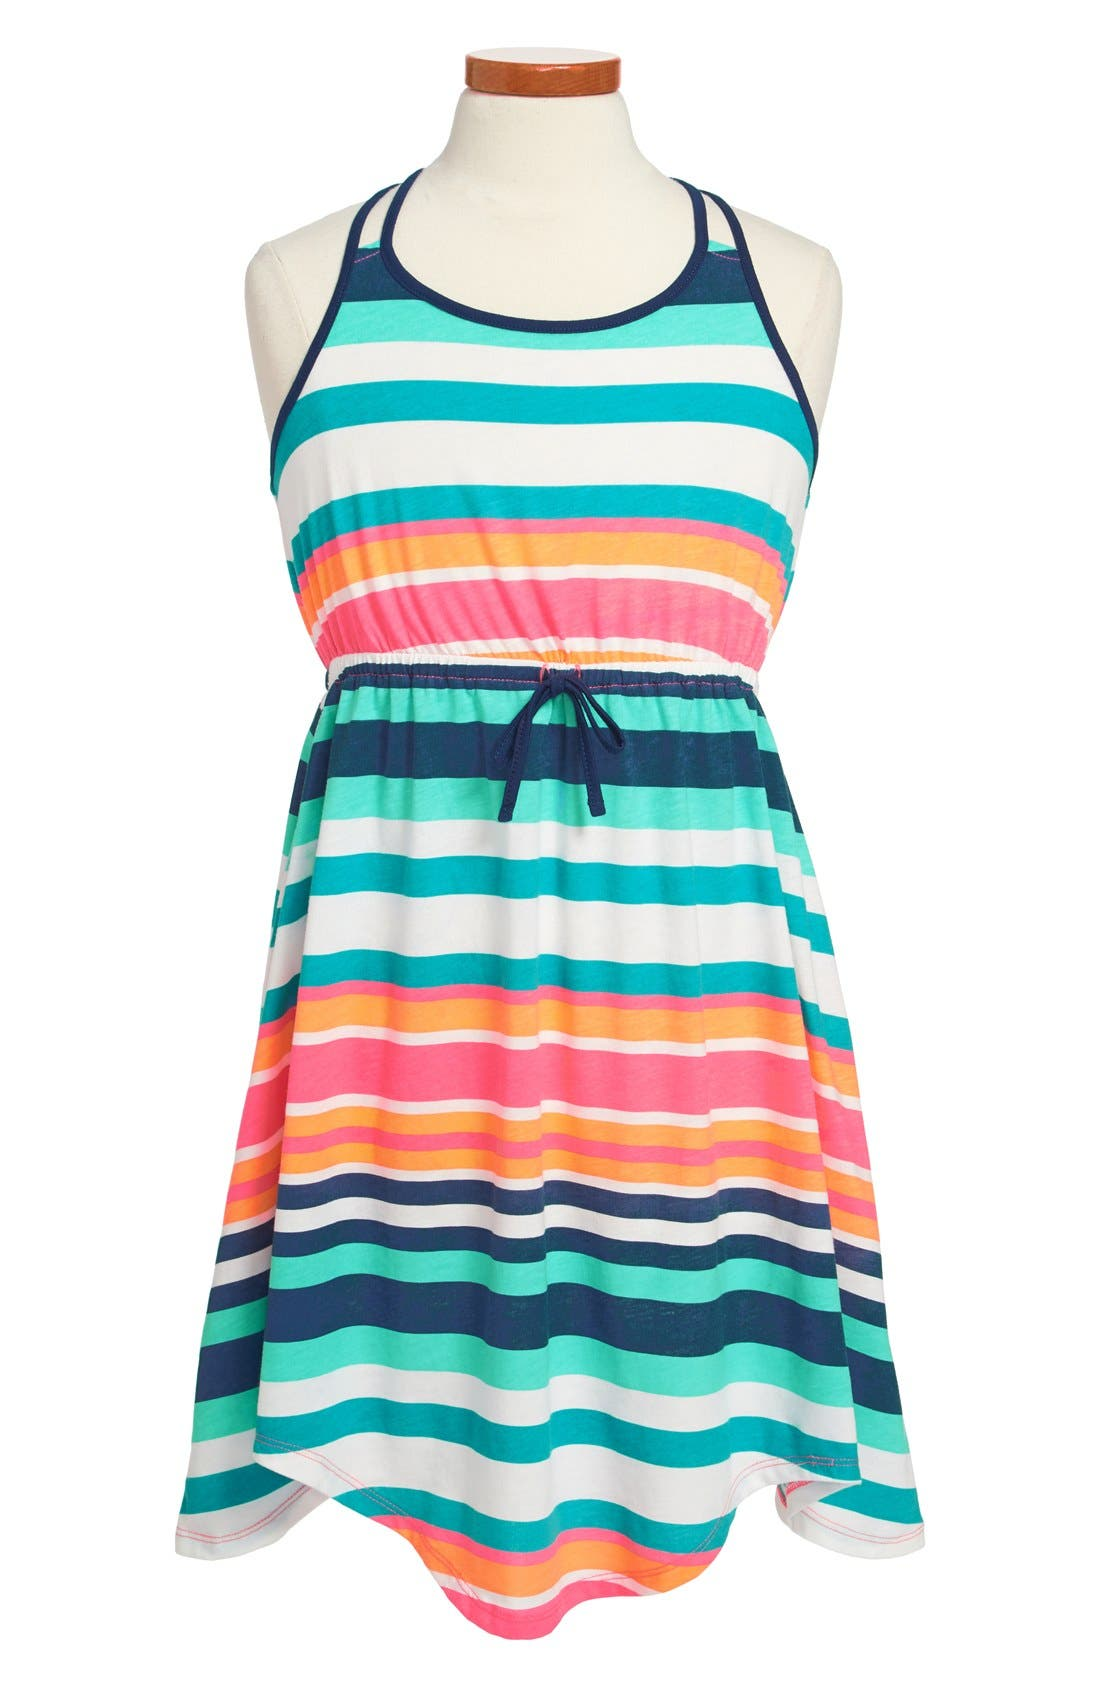 Alternate Image 1 Selected - Roxy 'Just Begun' Stripe Dress (Big Girls)